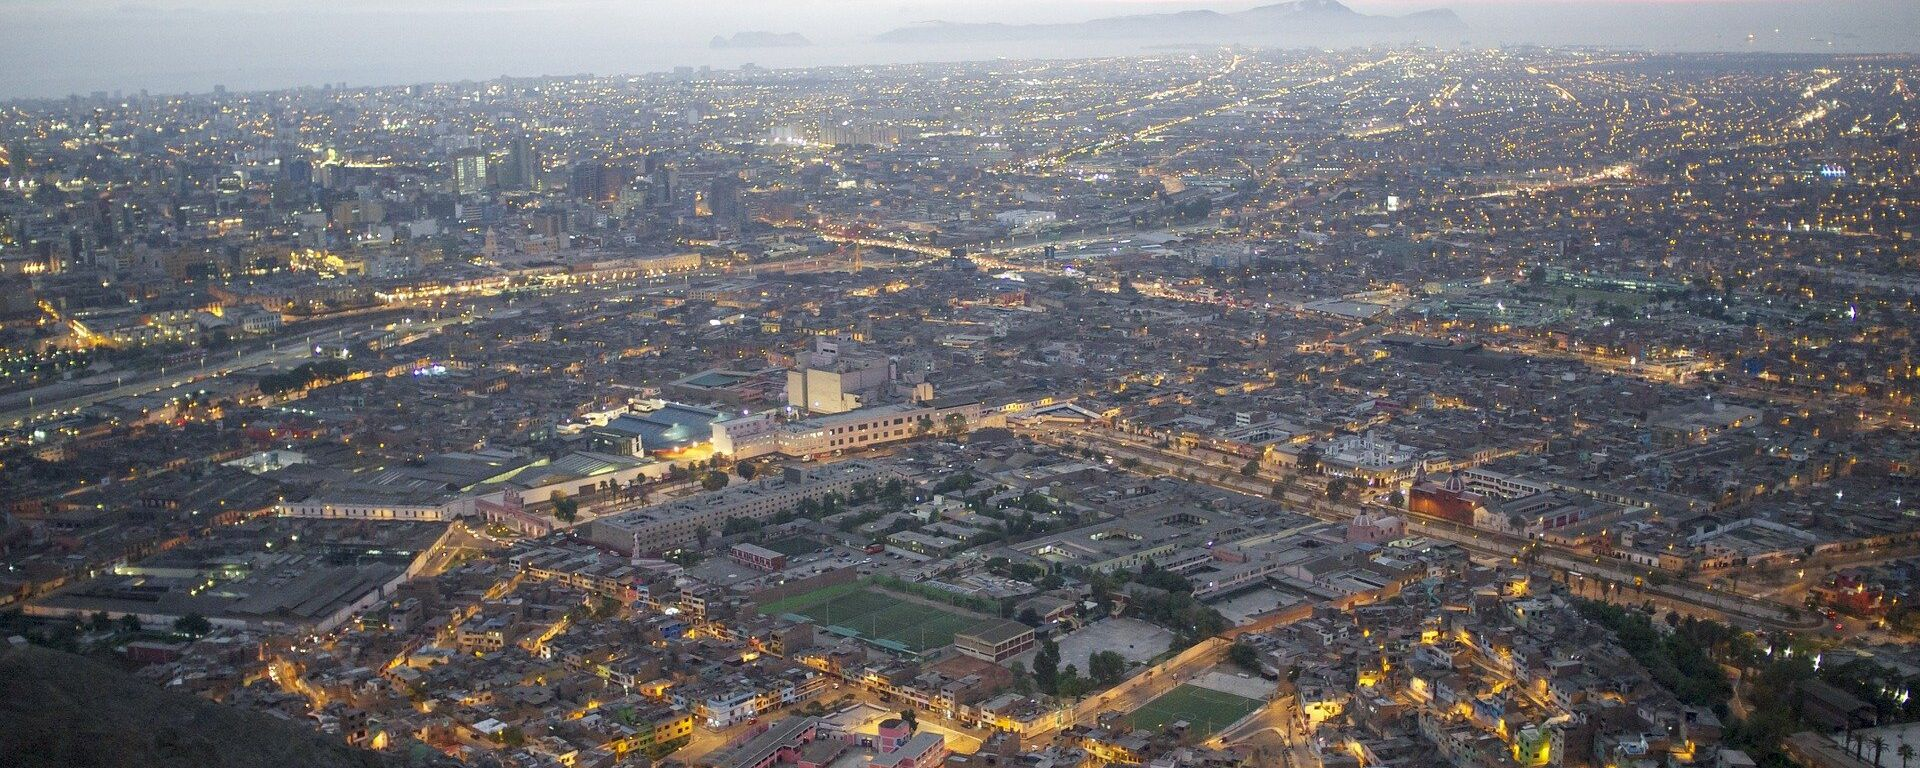 Lima, la capital de Perú - Sputnik Mundo, 1920, 07.09.2021